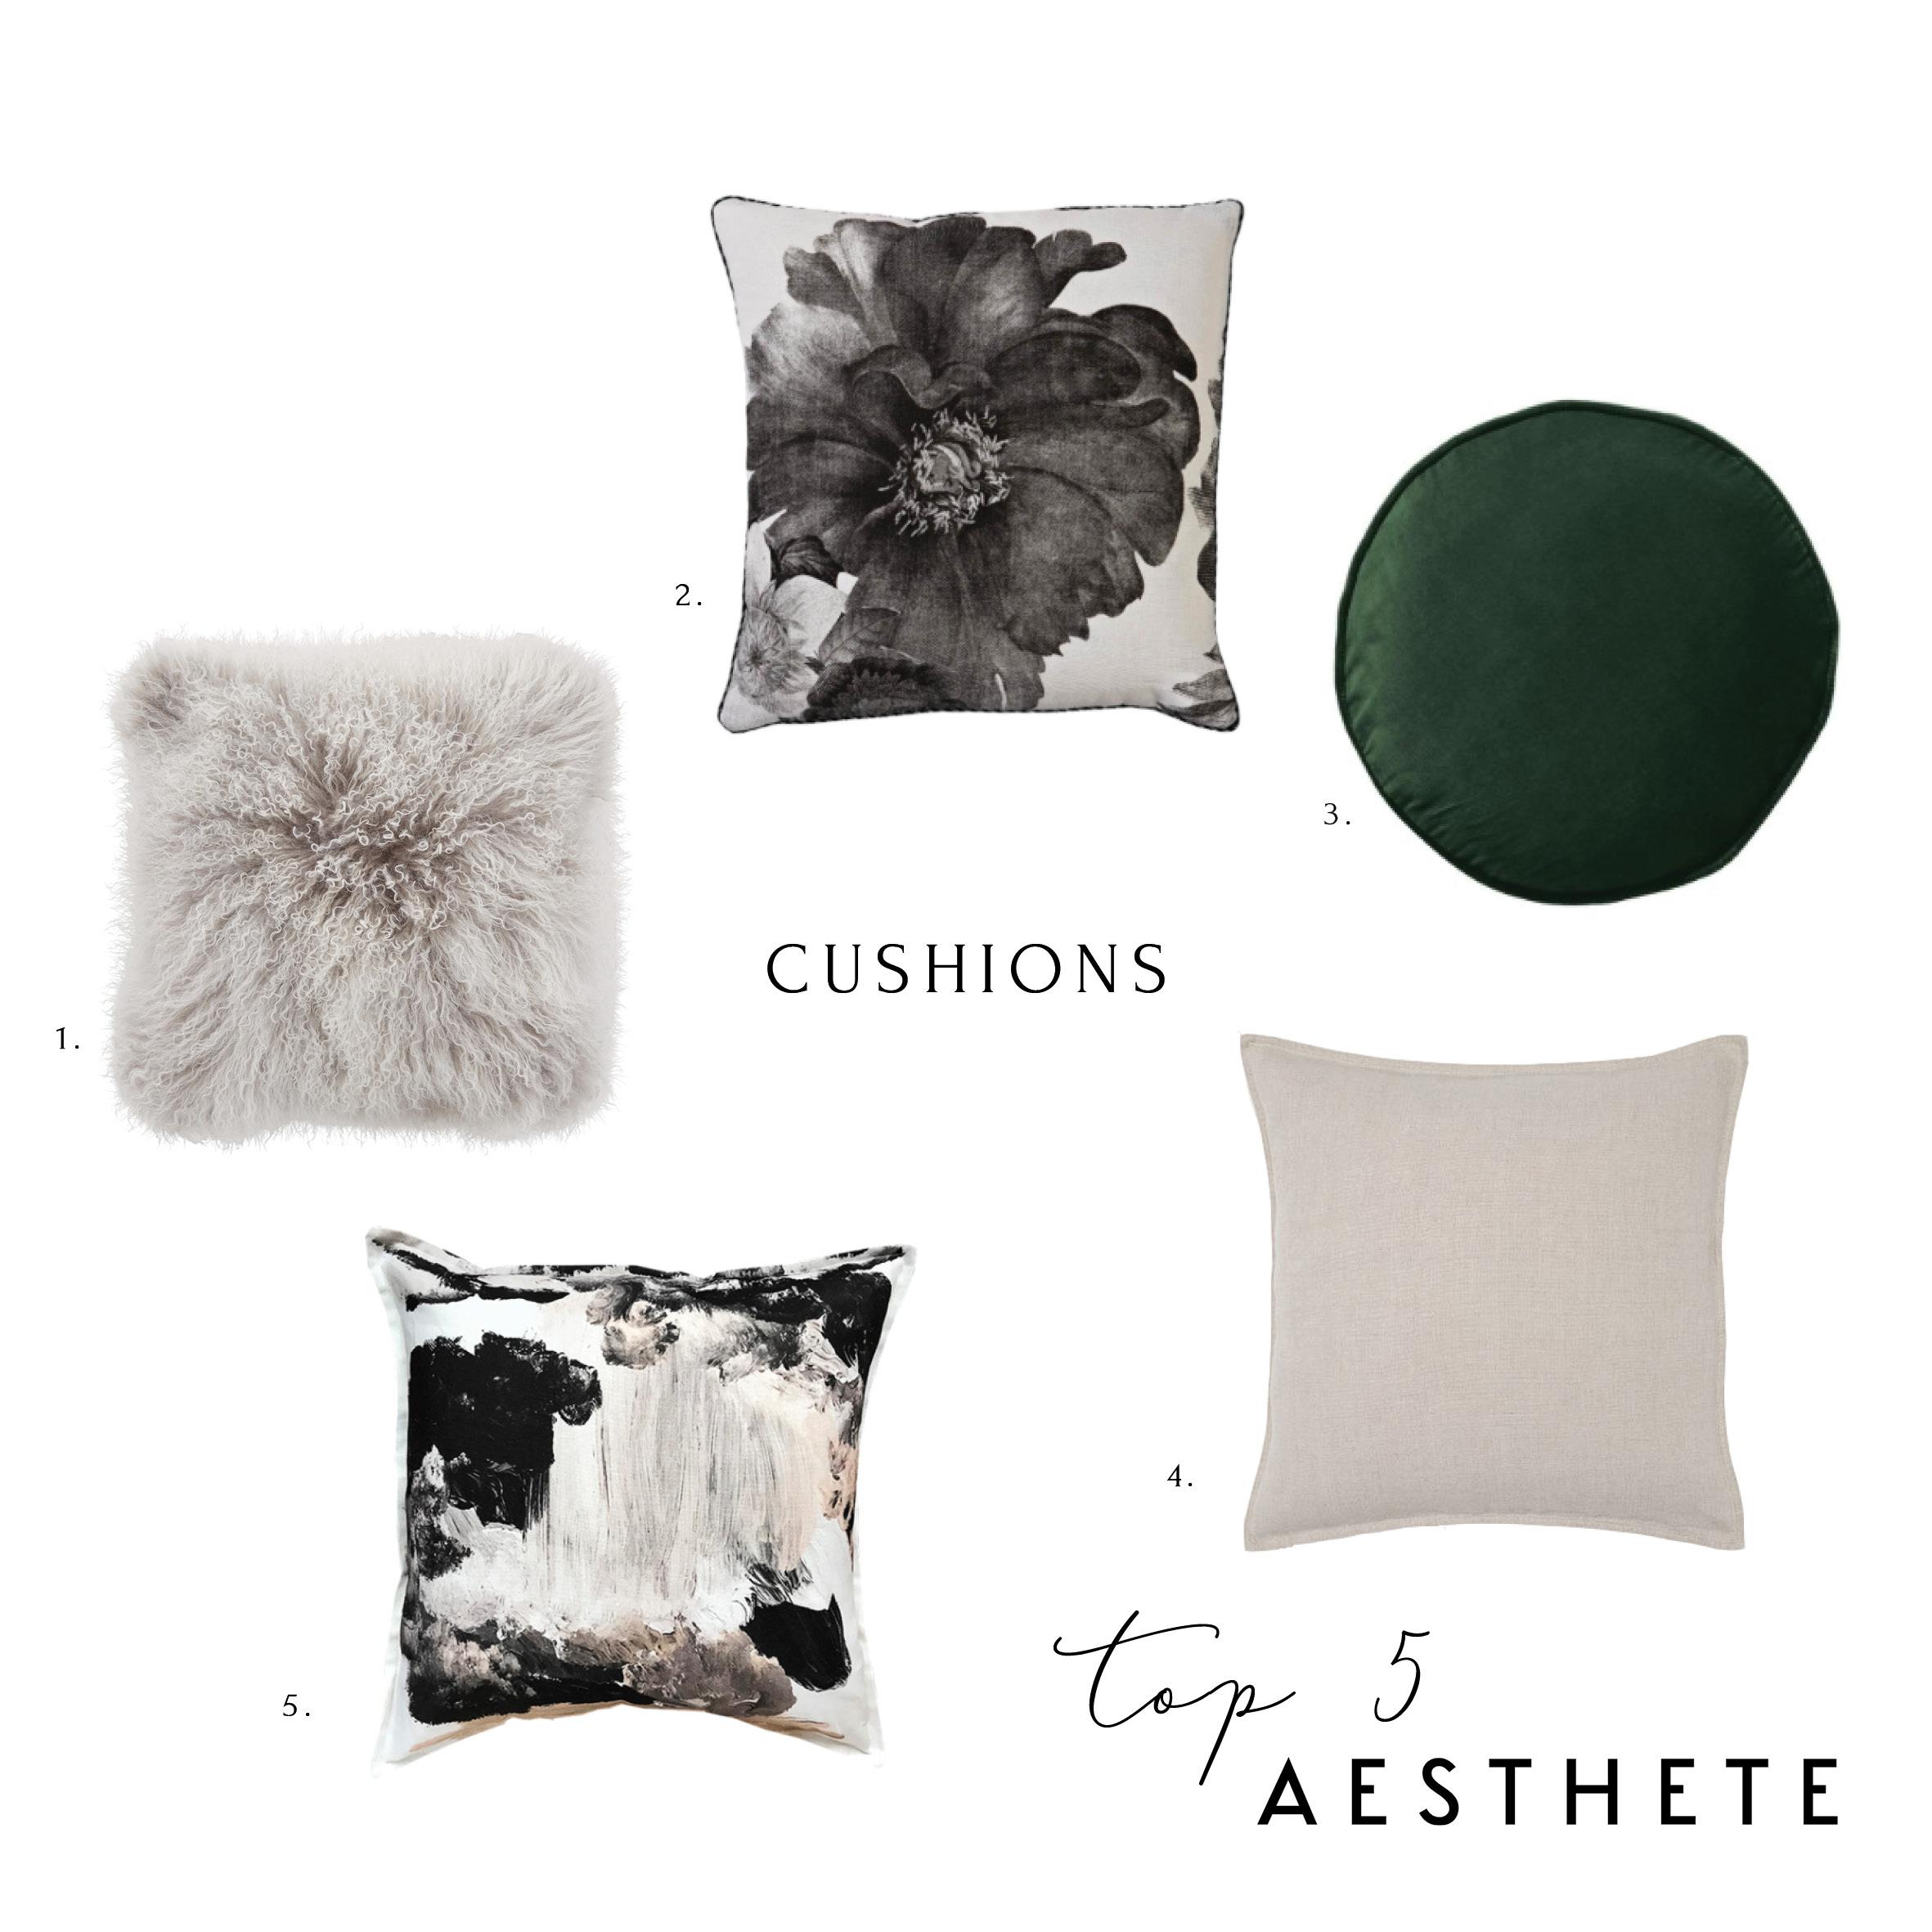 Aesthete Top 5 Cushions